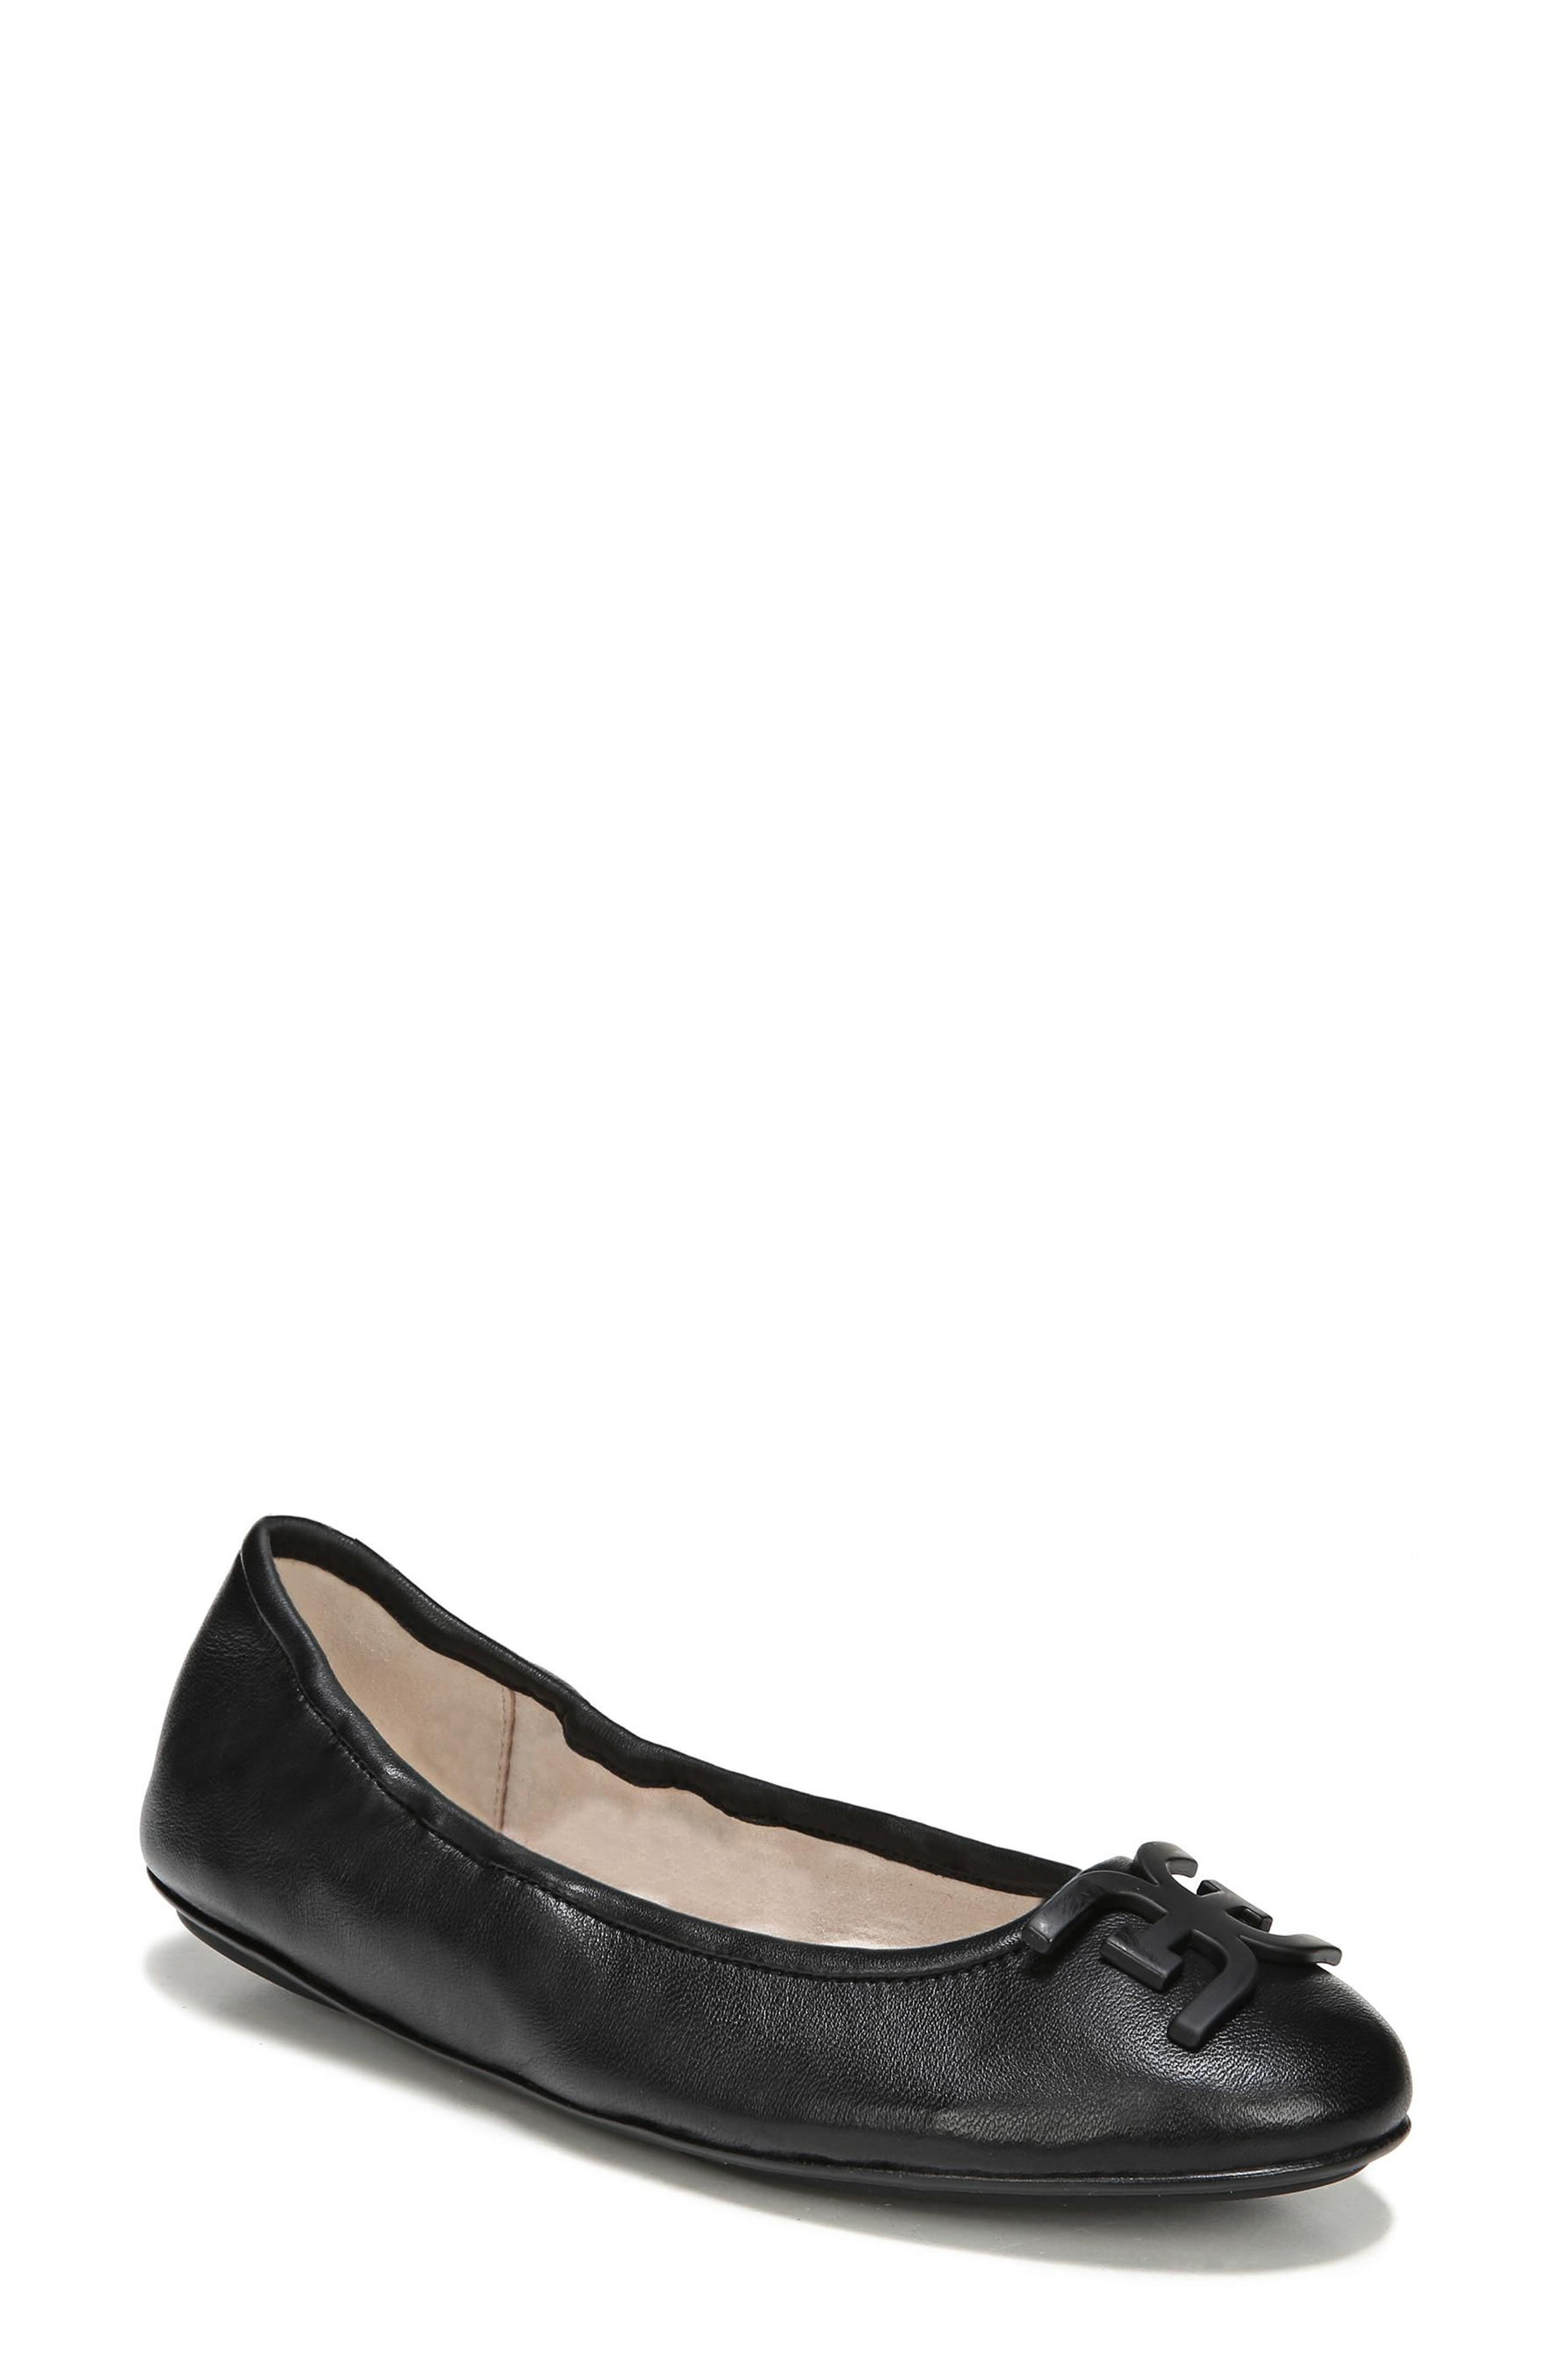 Florence Ballet Flat,                         Main,                         color, Black Leather